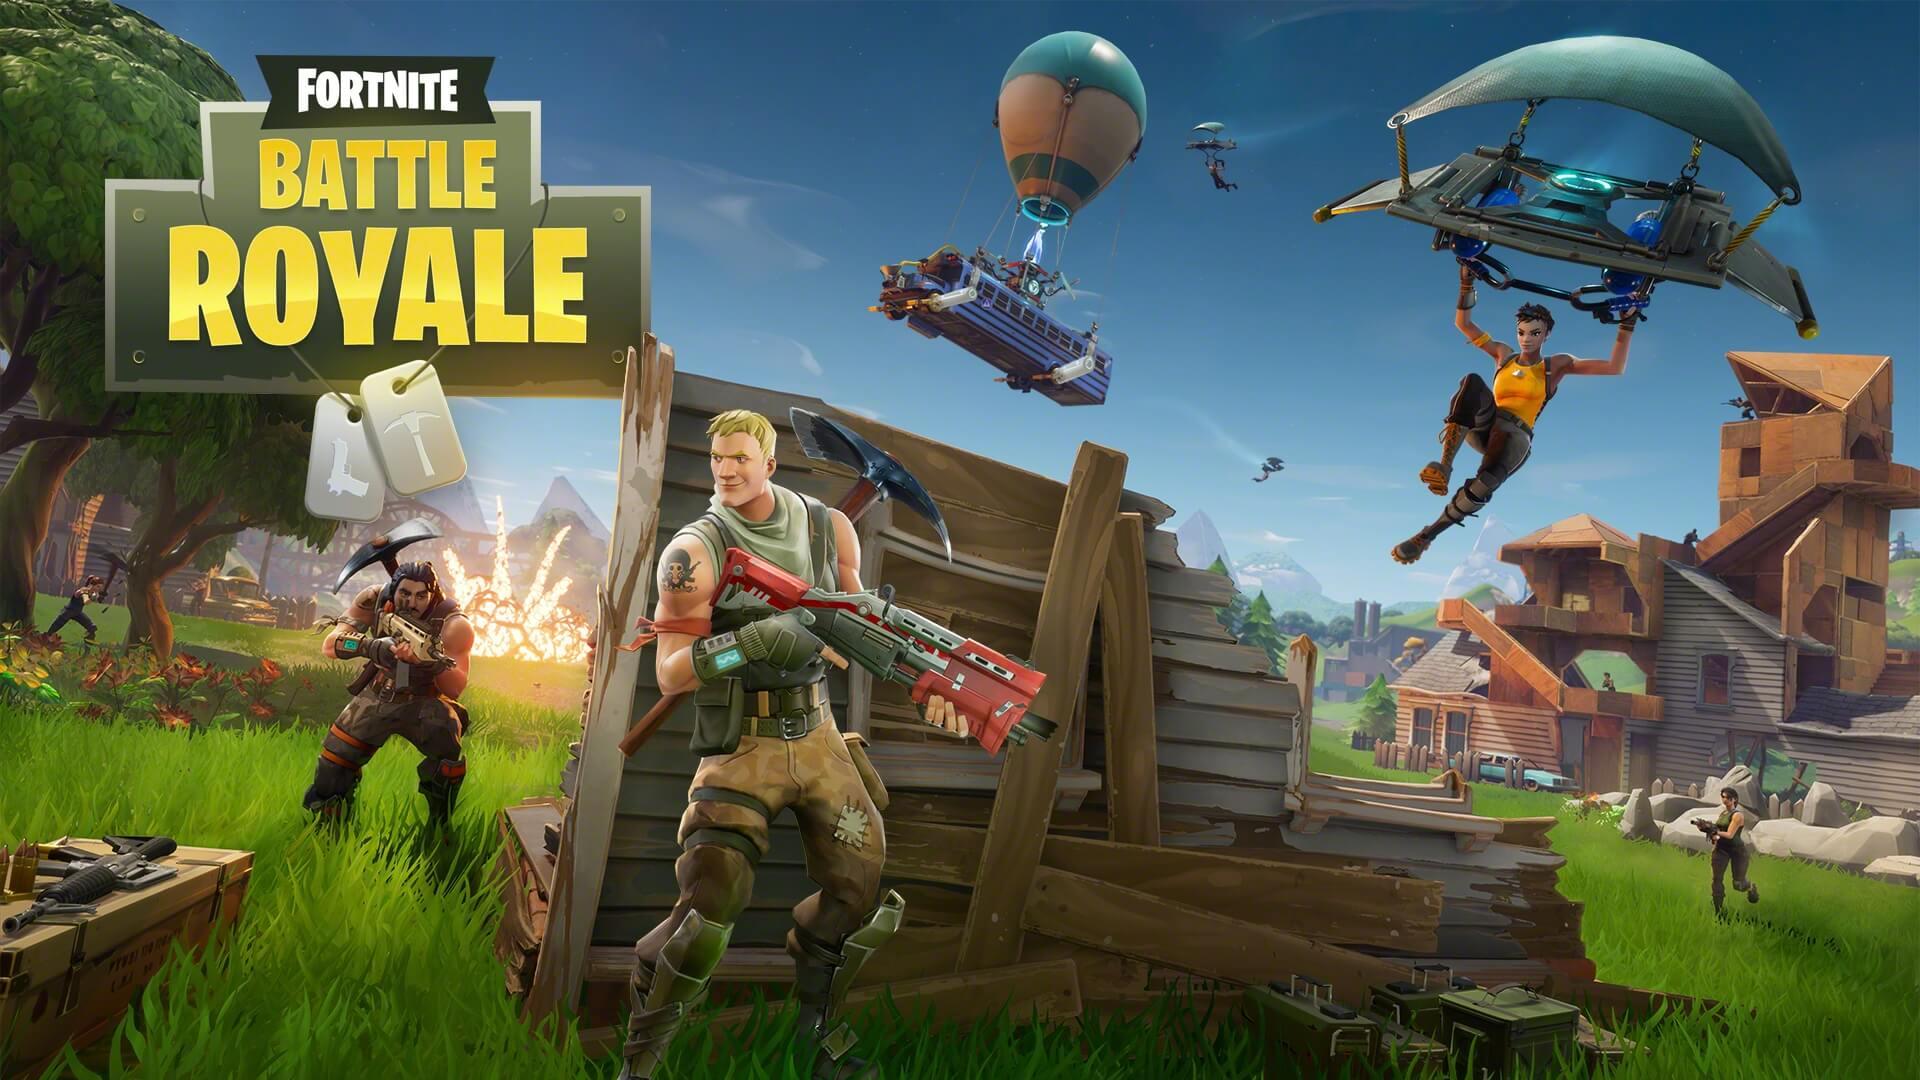 epic games announce battle royale mode for fortnite